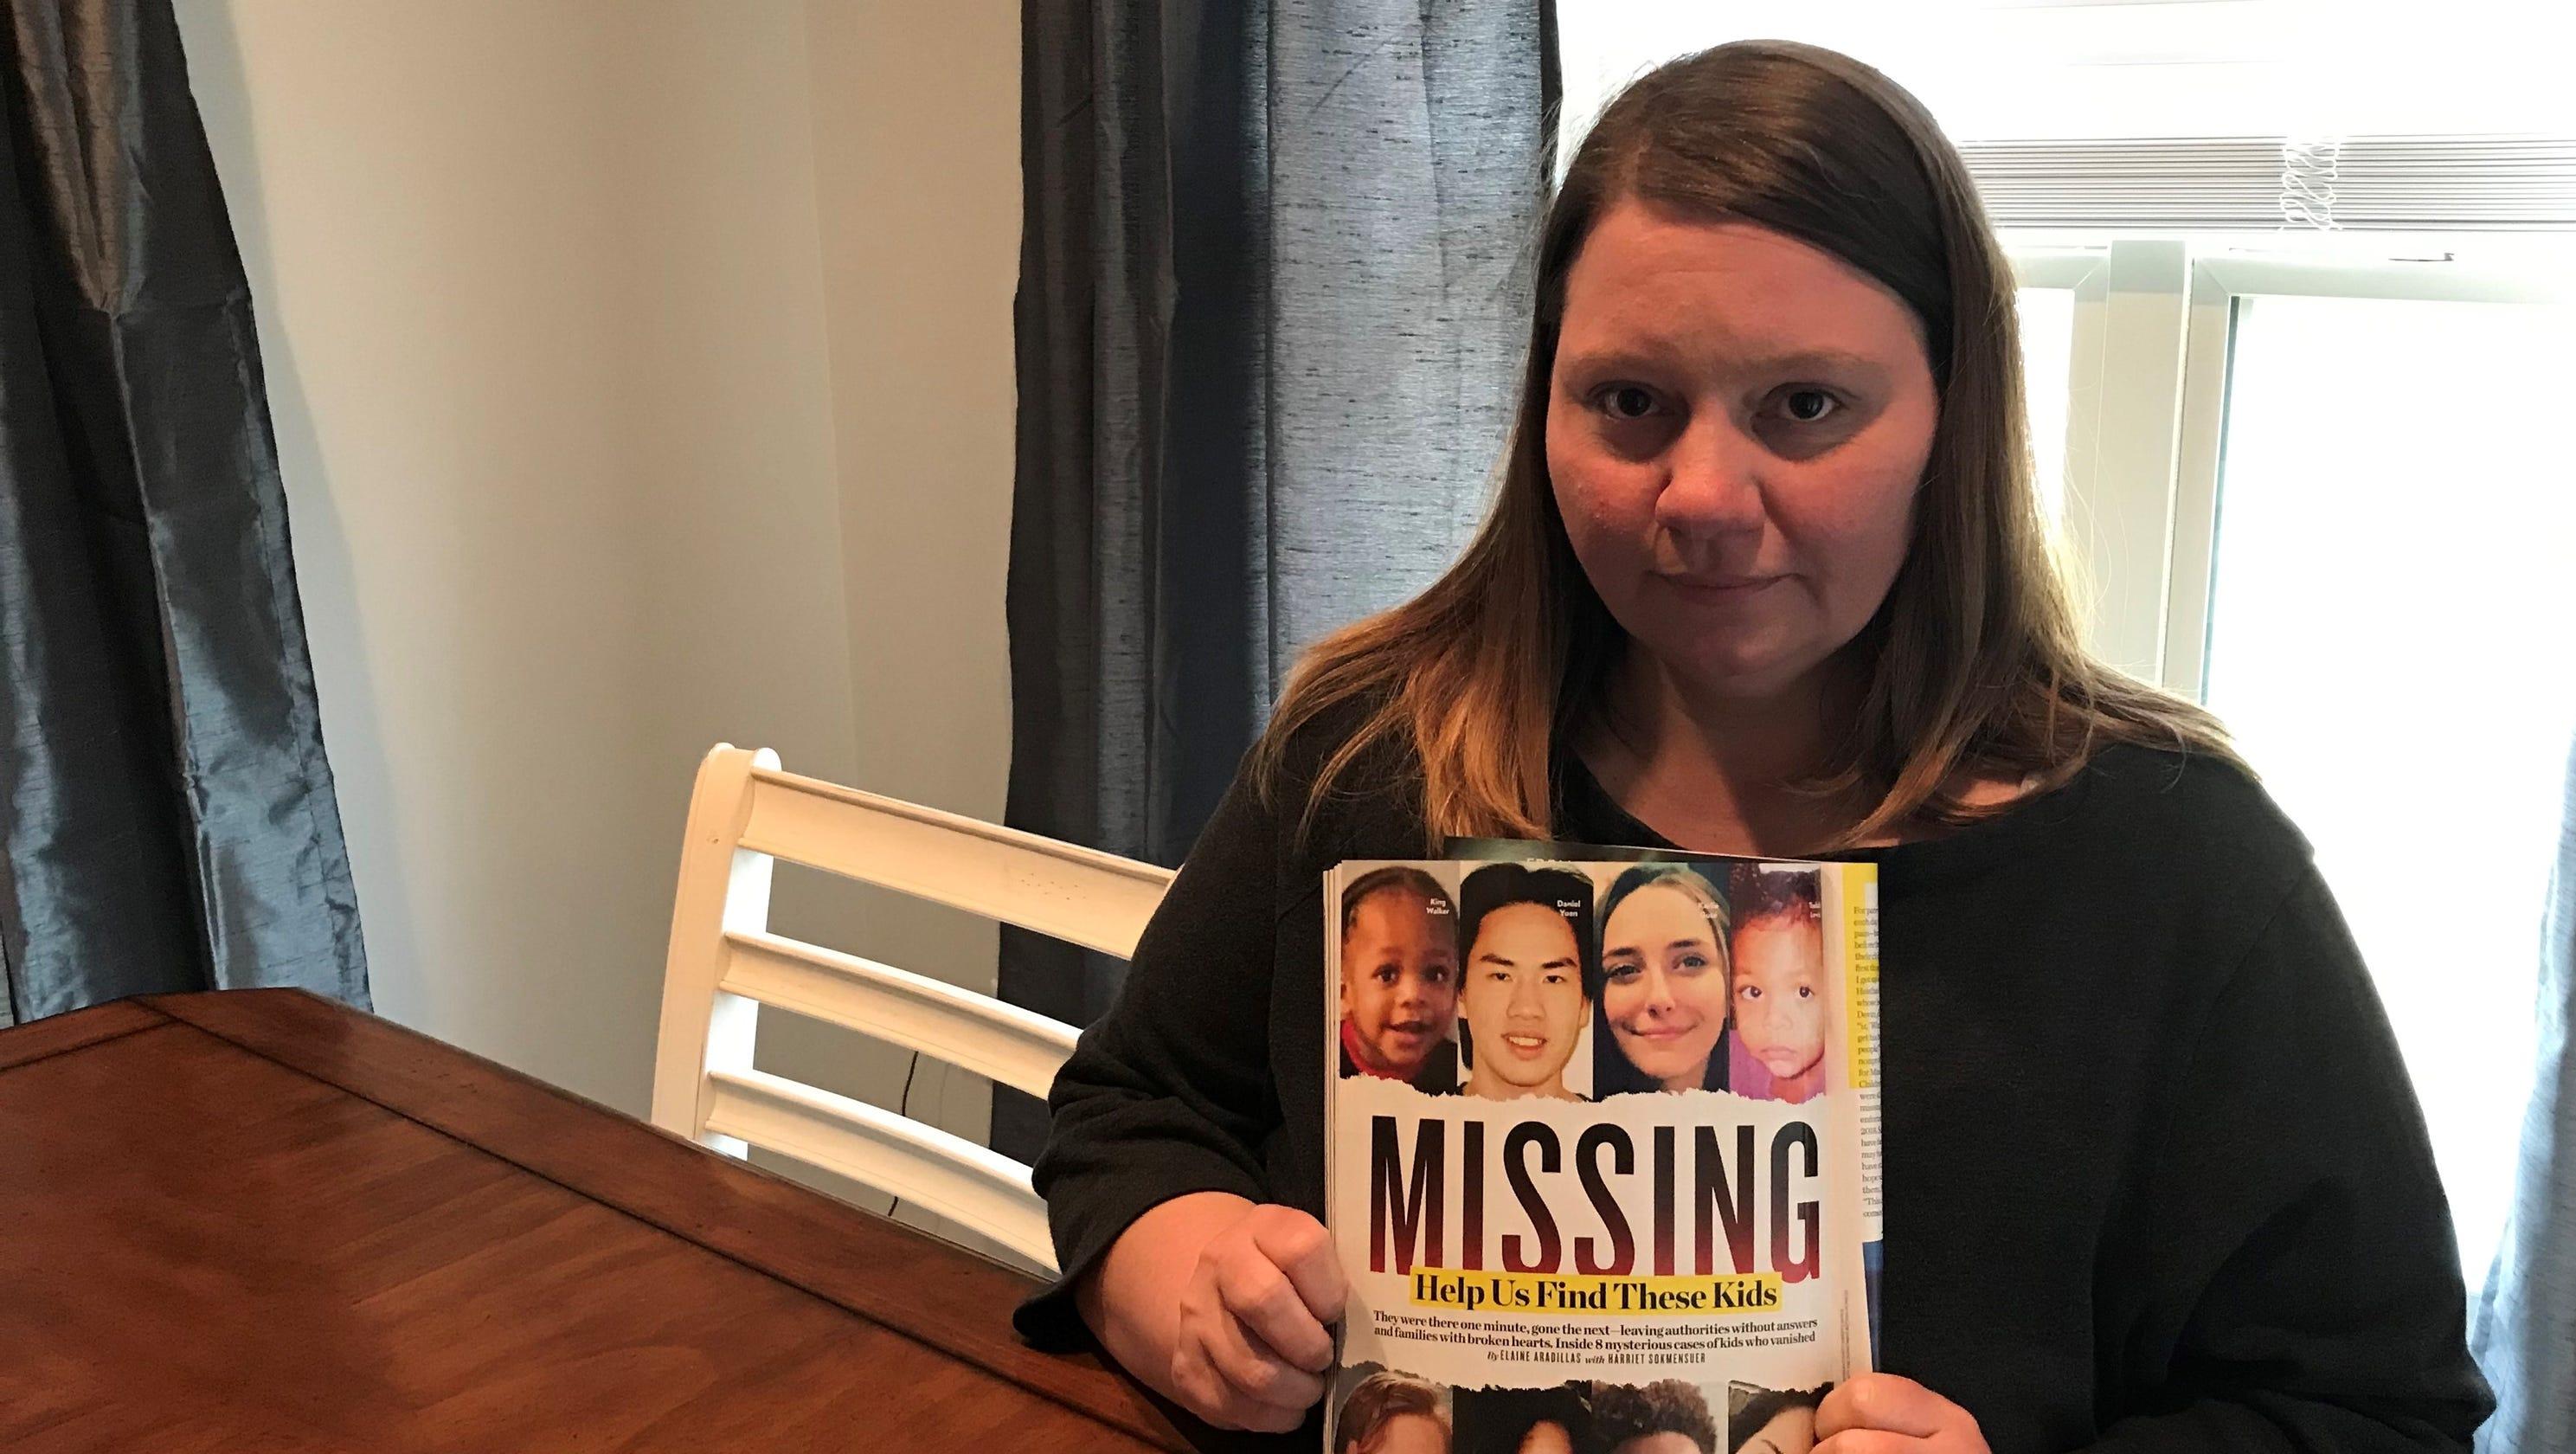 Devin Bond, Murfreesboro teen, still missing 2 years later